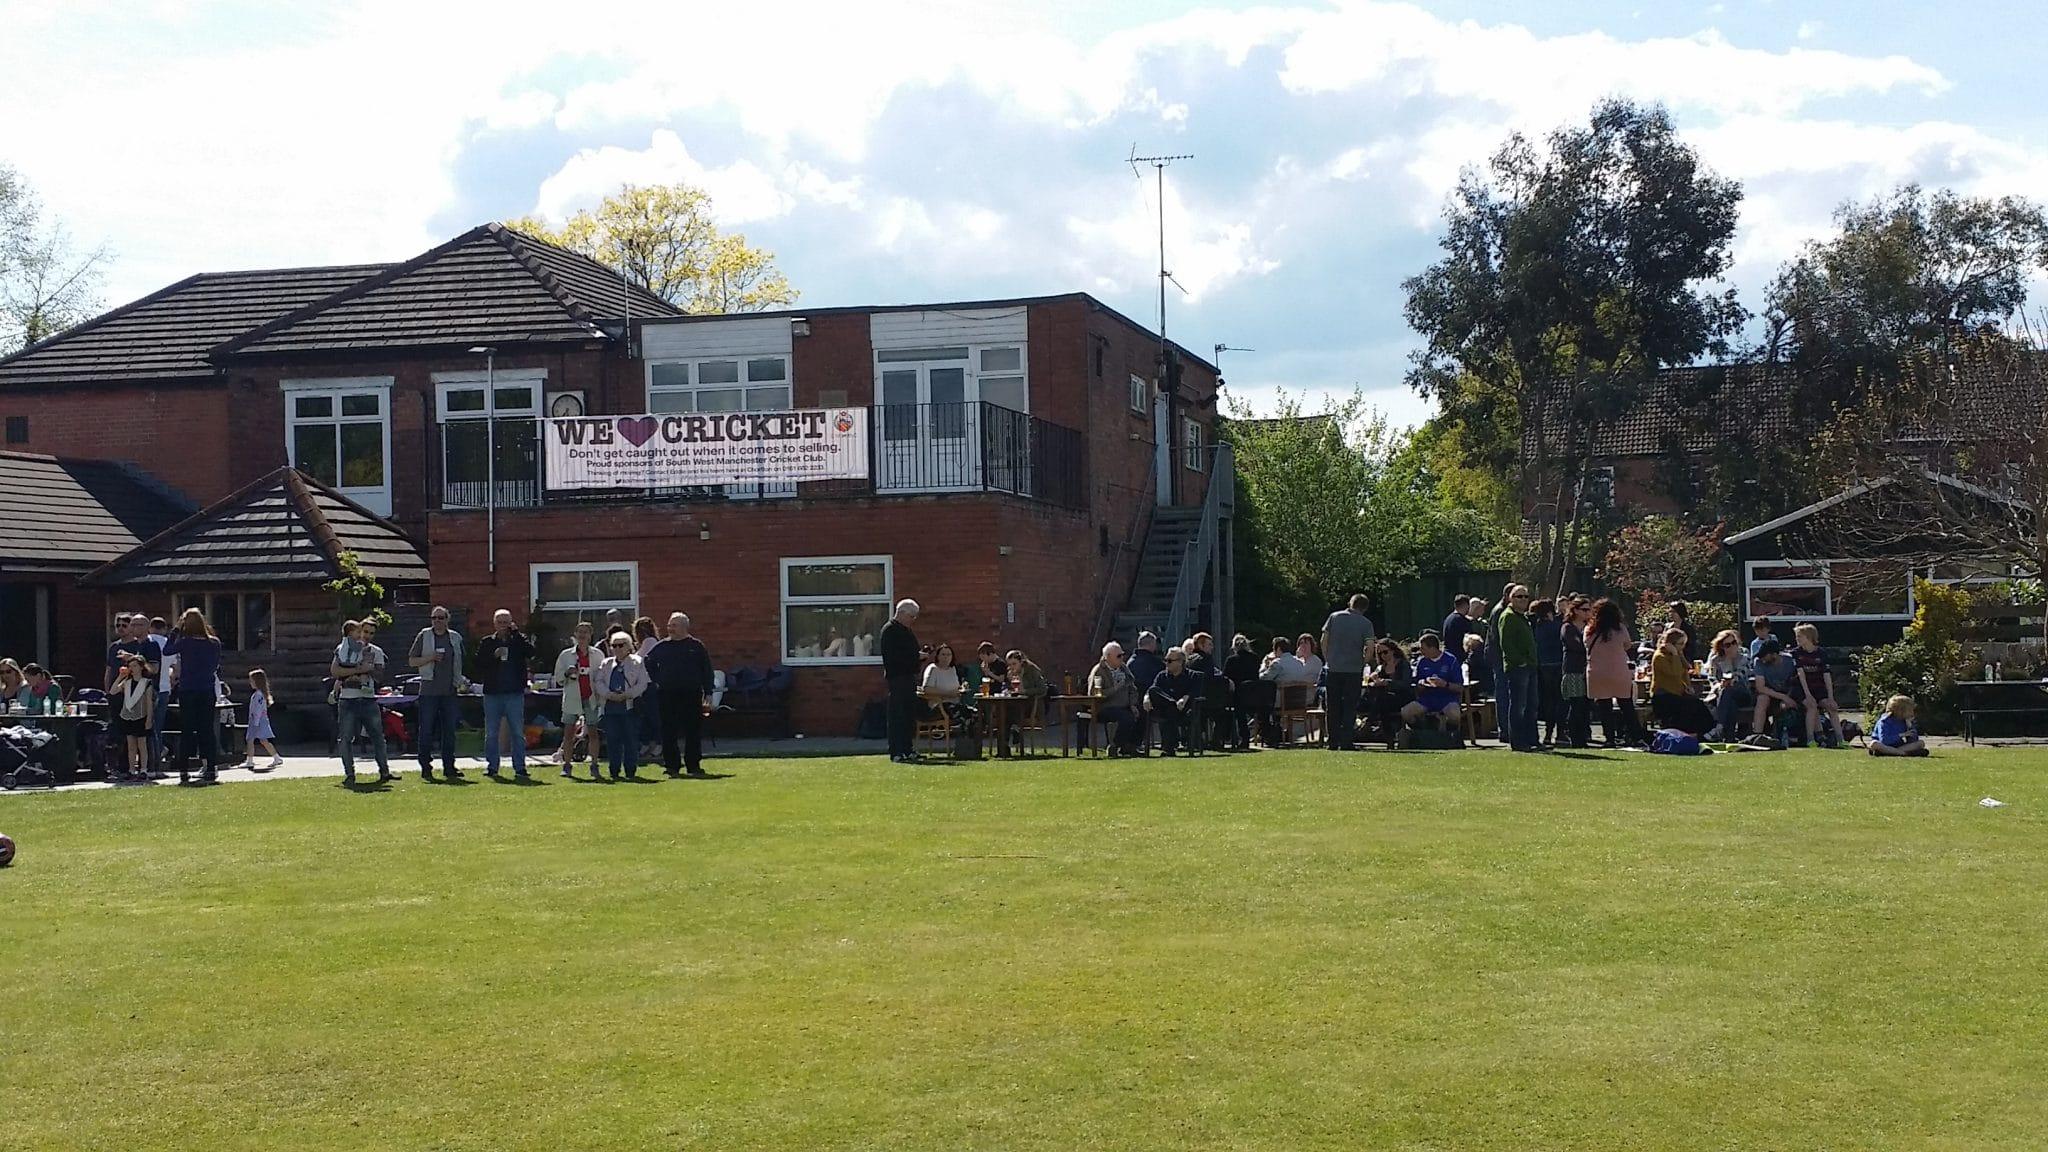 we love cricket